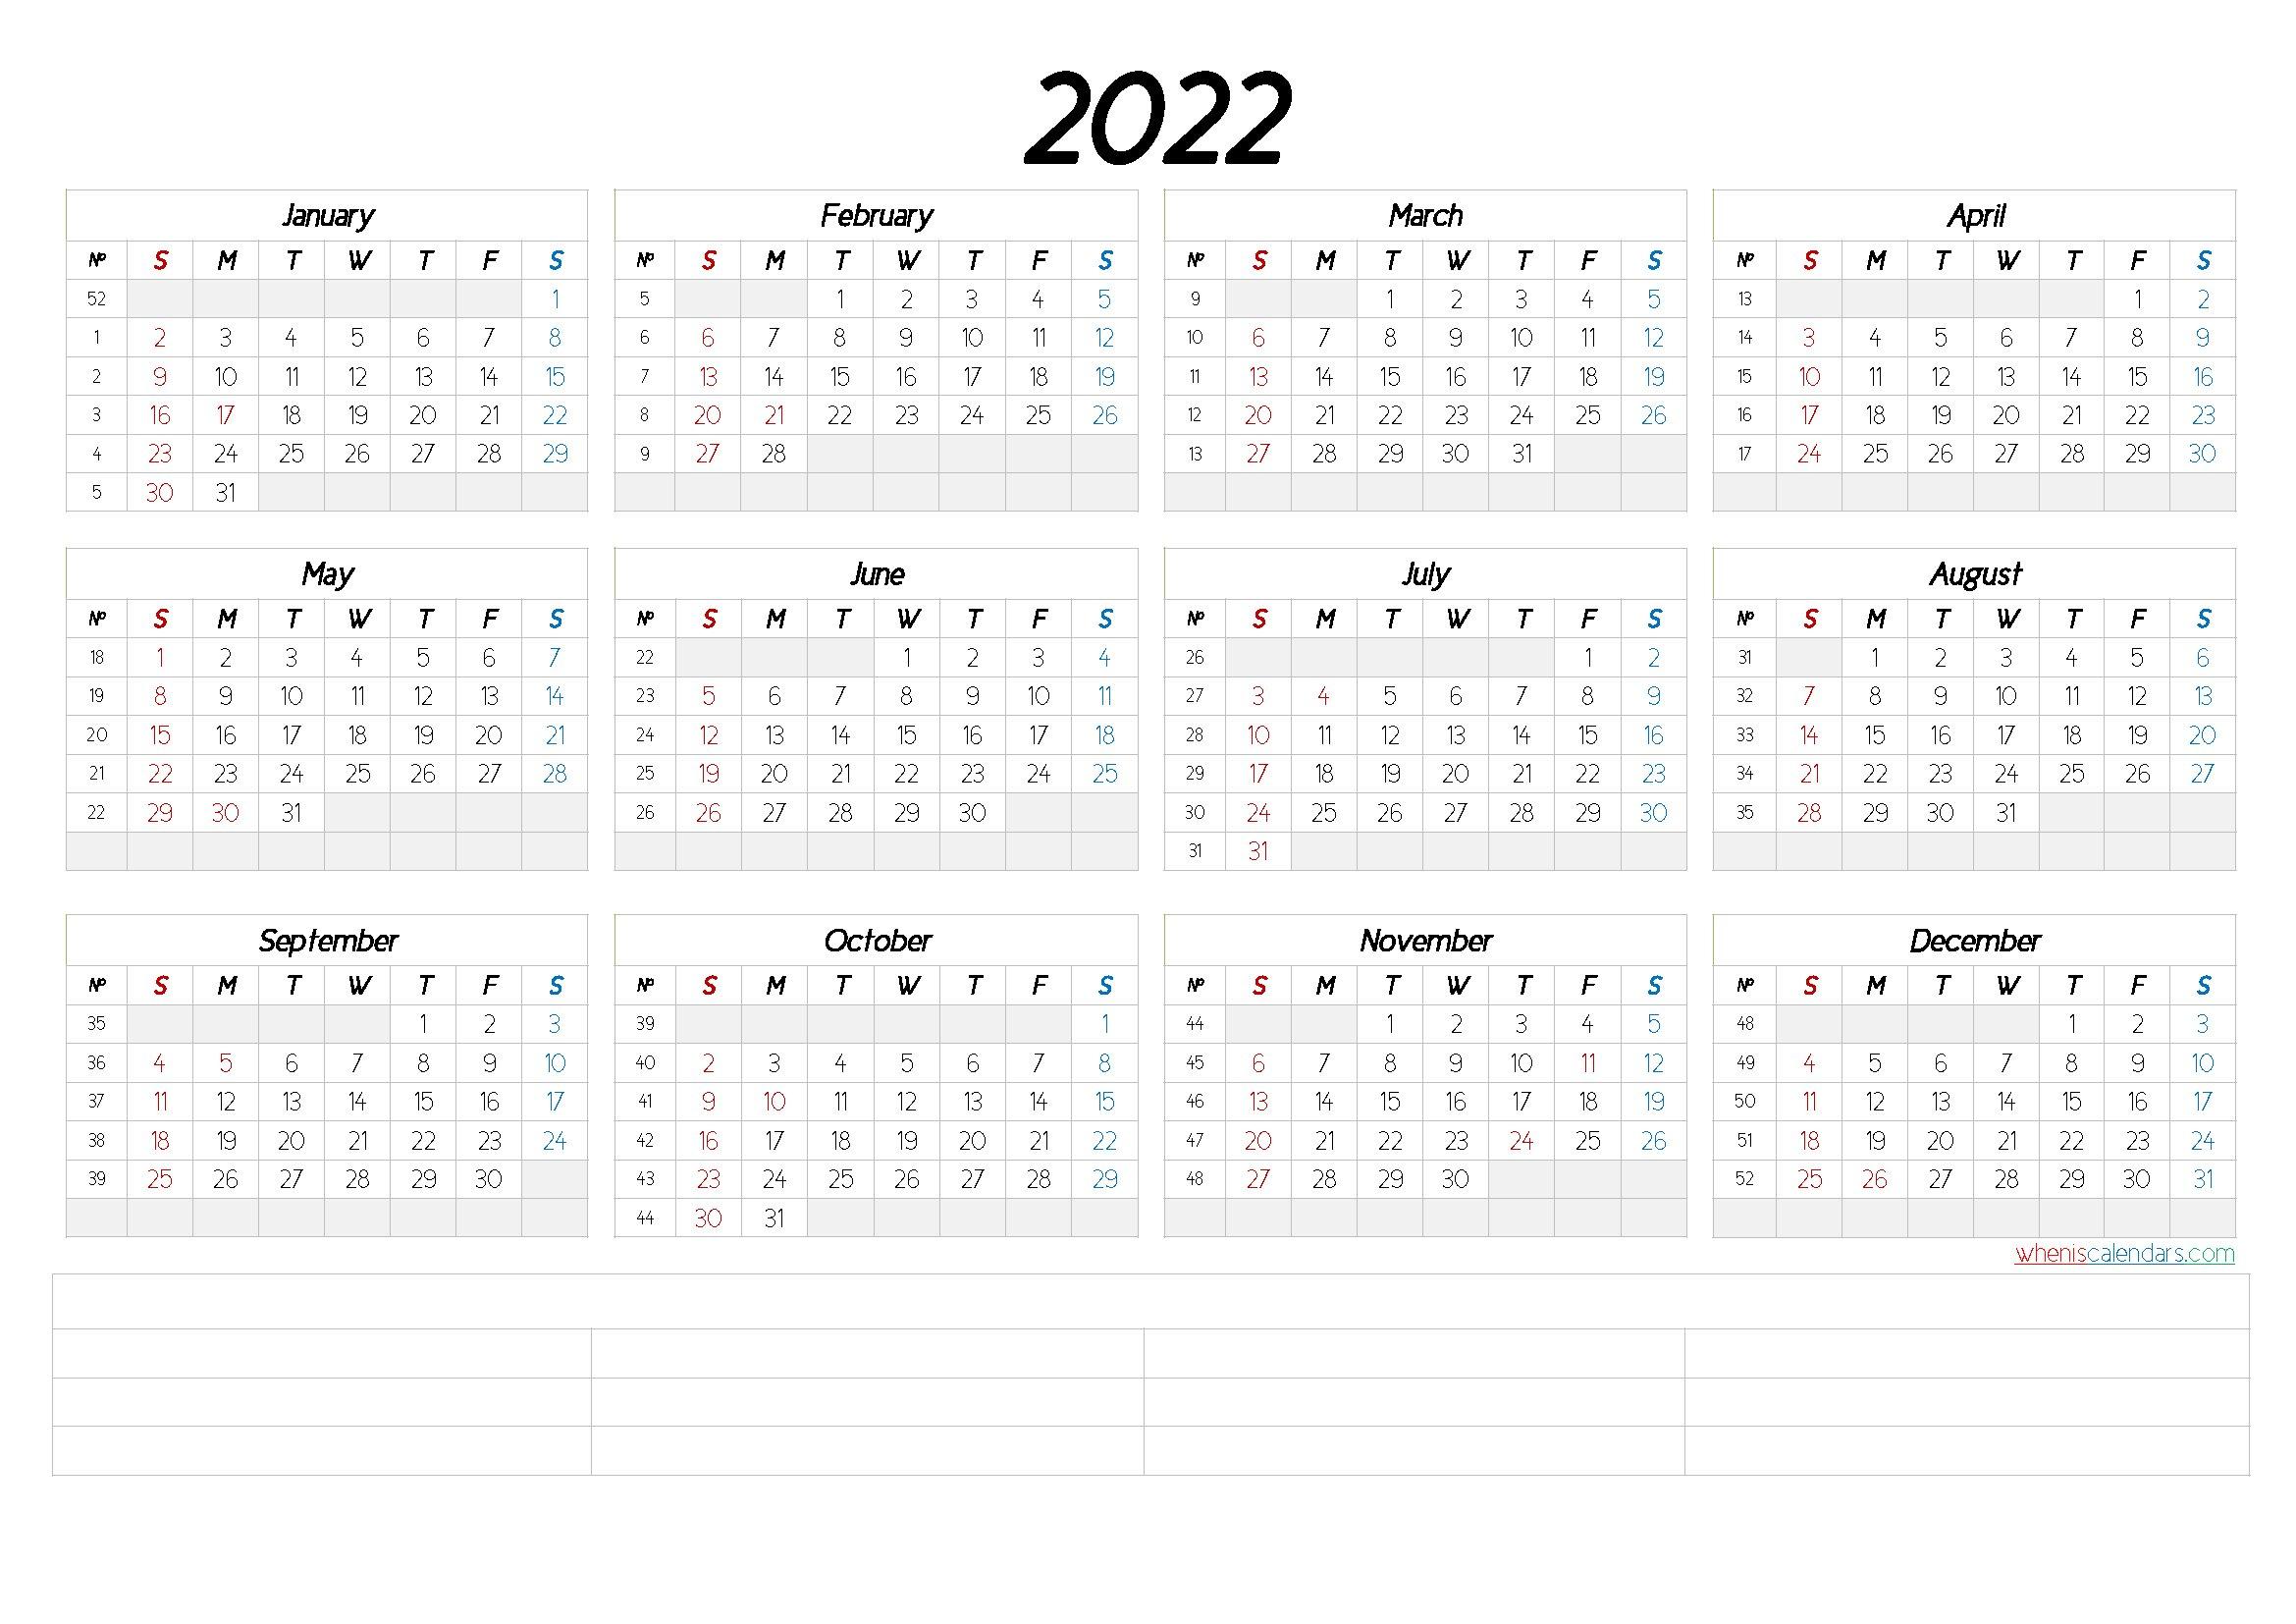 2022 Free Printable Yearly Calendar With Week Numbers intended for Free Printable 2022 September Calendar Image